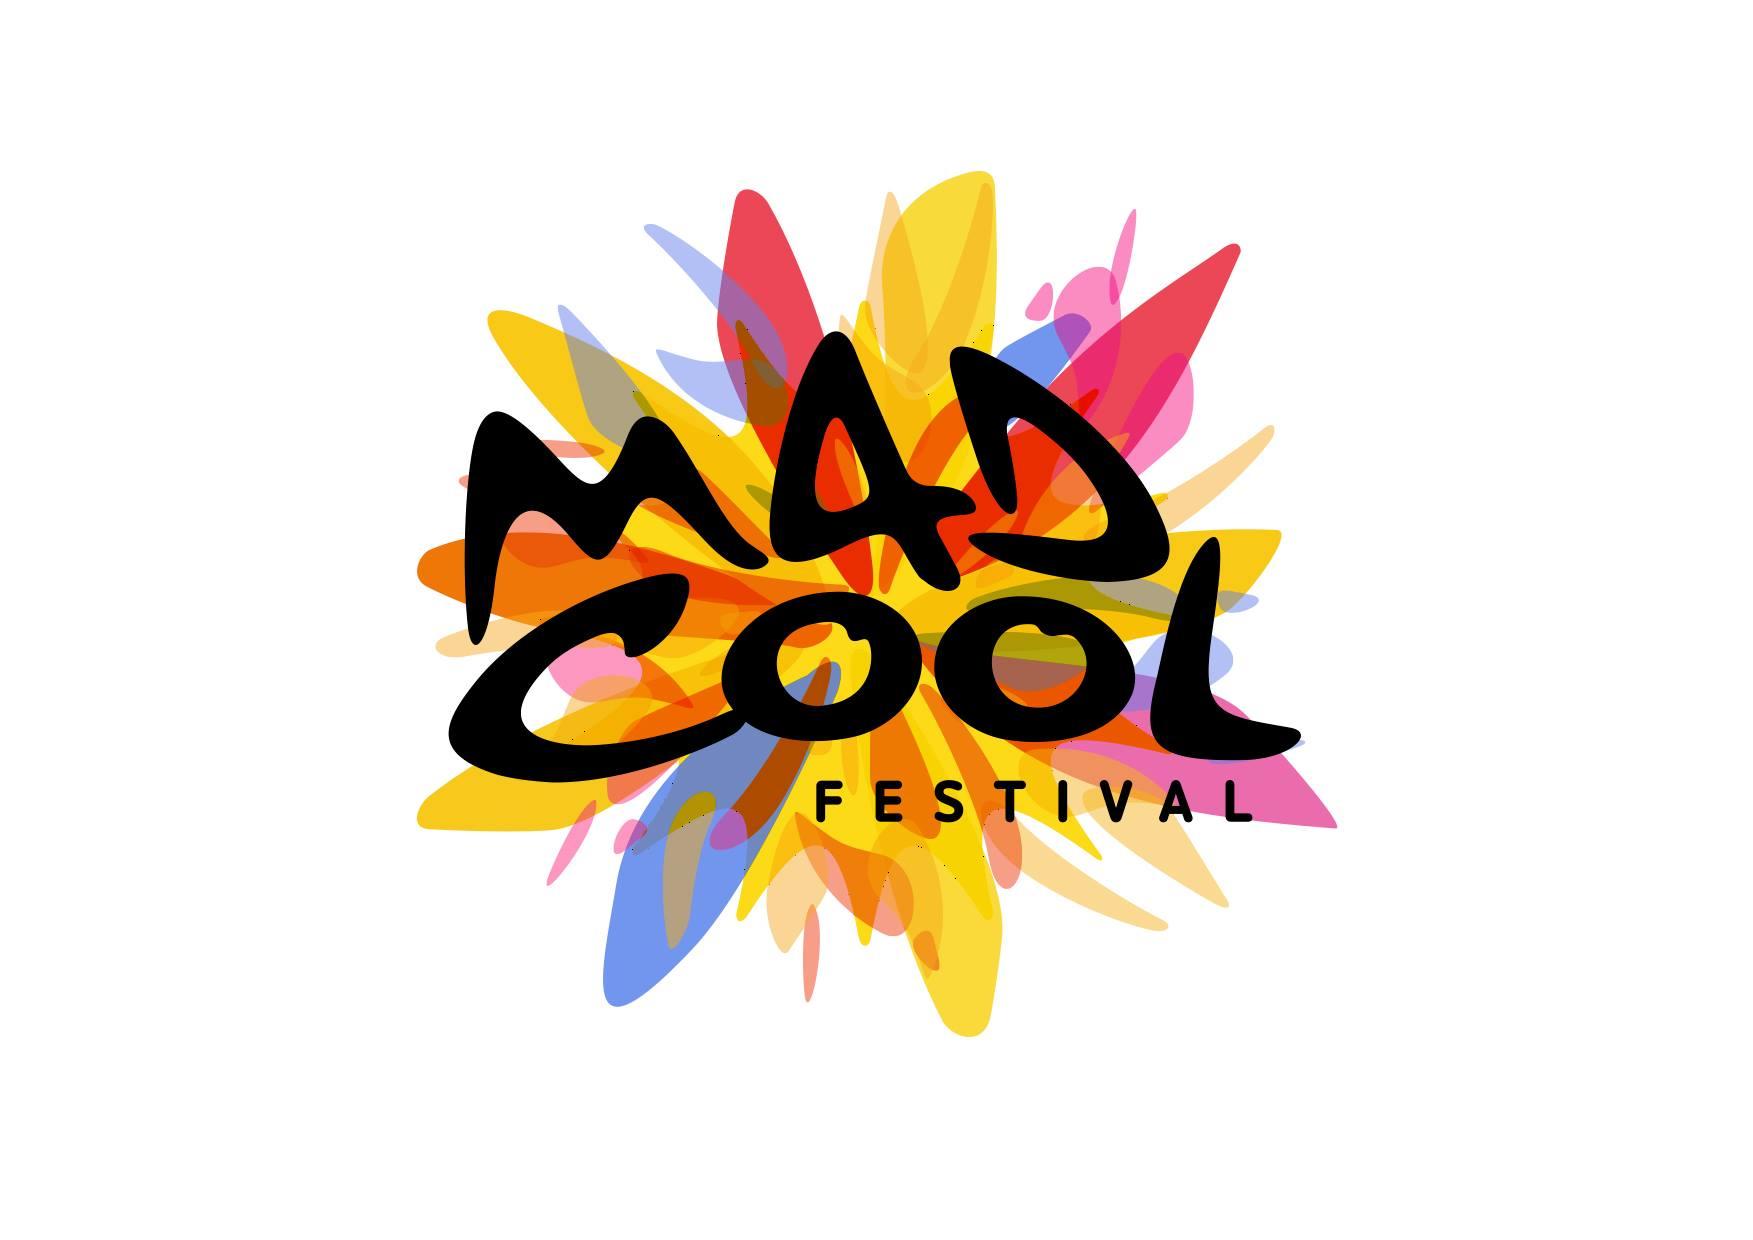 Comunicación de crisis: Errores del Mad Cool Festival